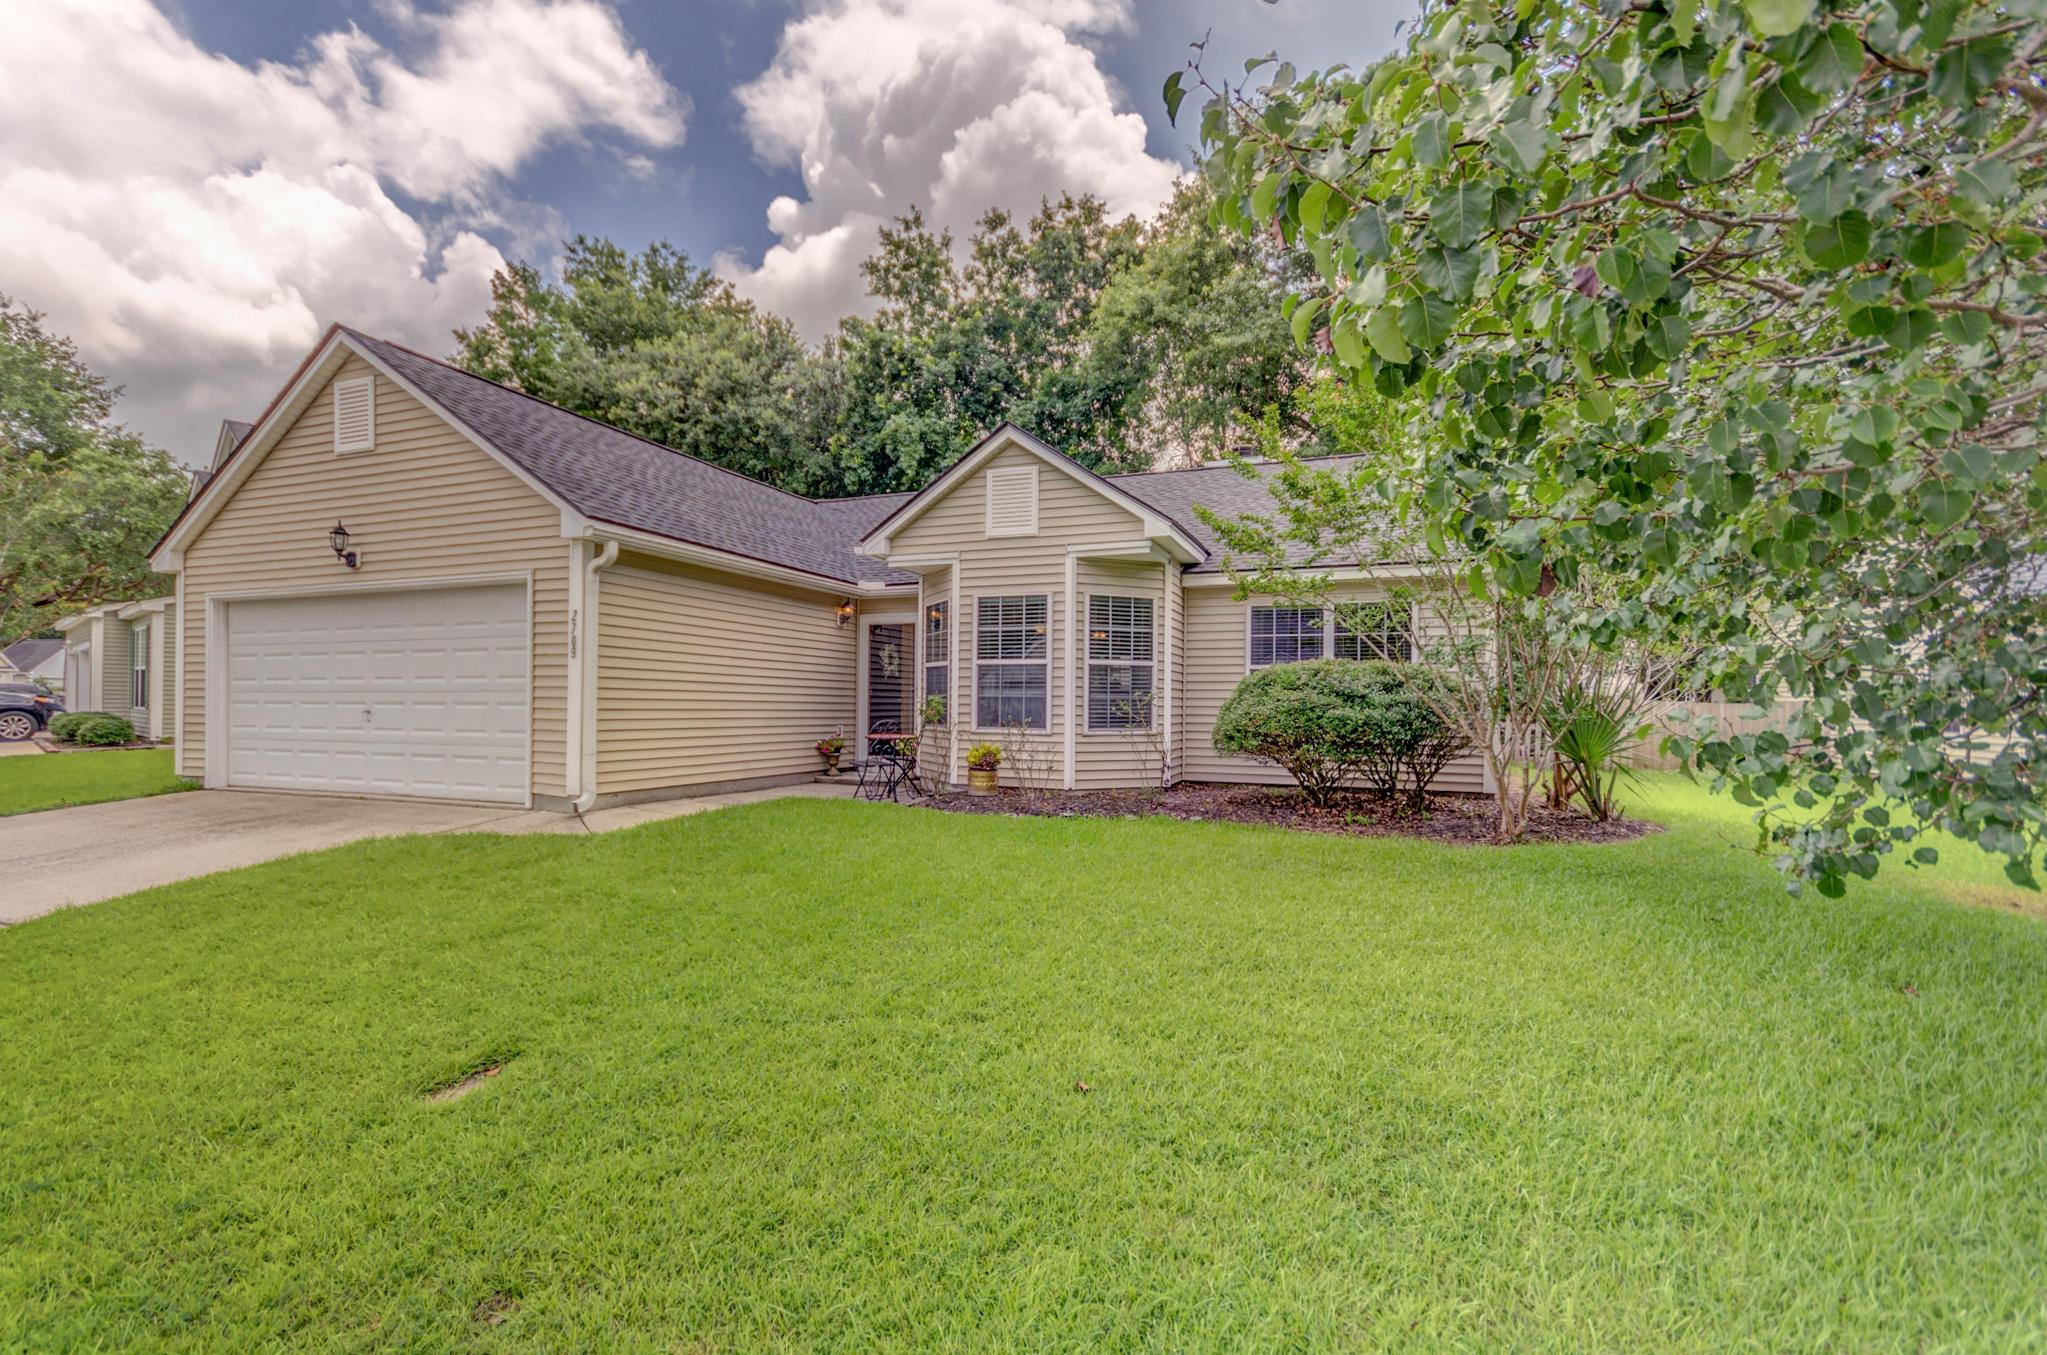 Planters Pointe Homes For Sale - 2709 Four Winds, Mount Pleasant, SC - 14